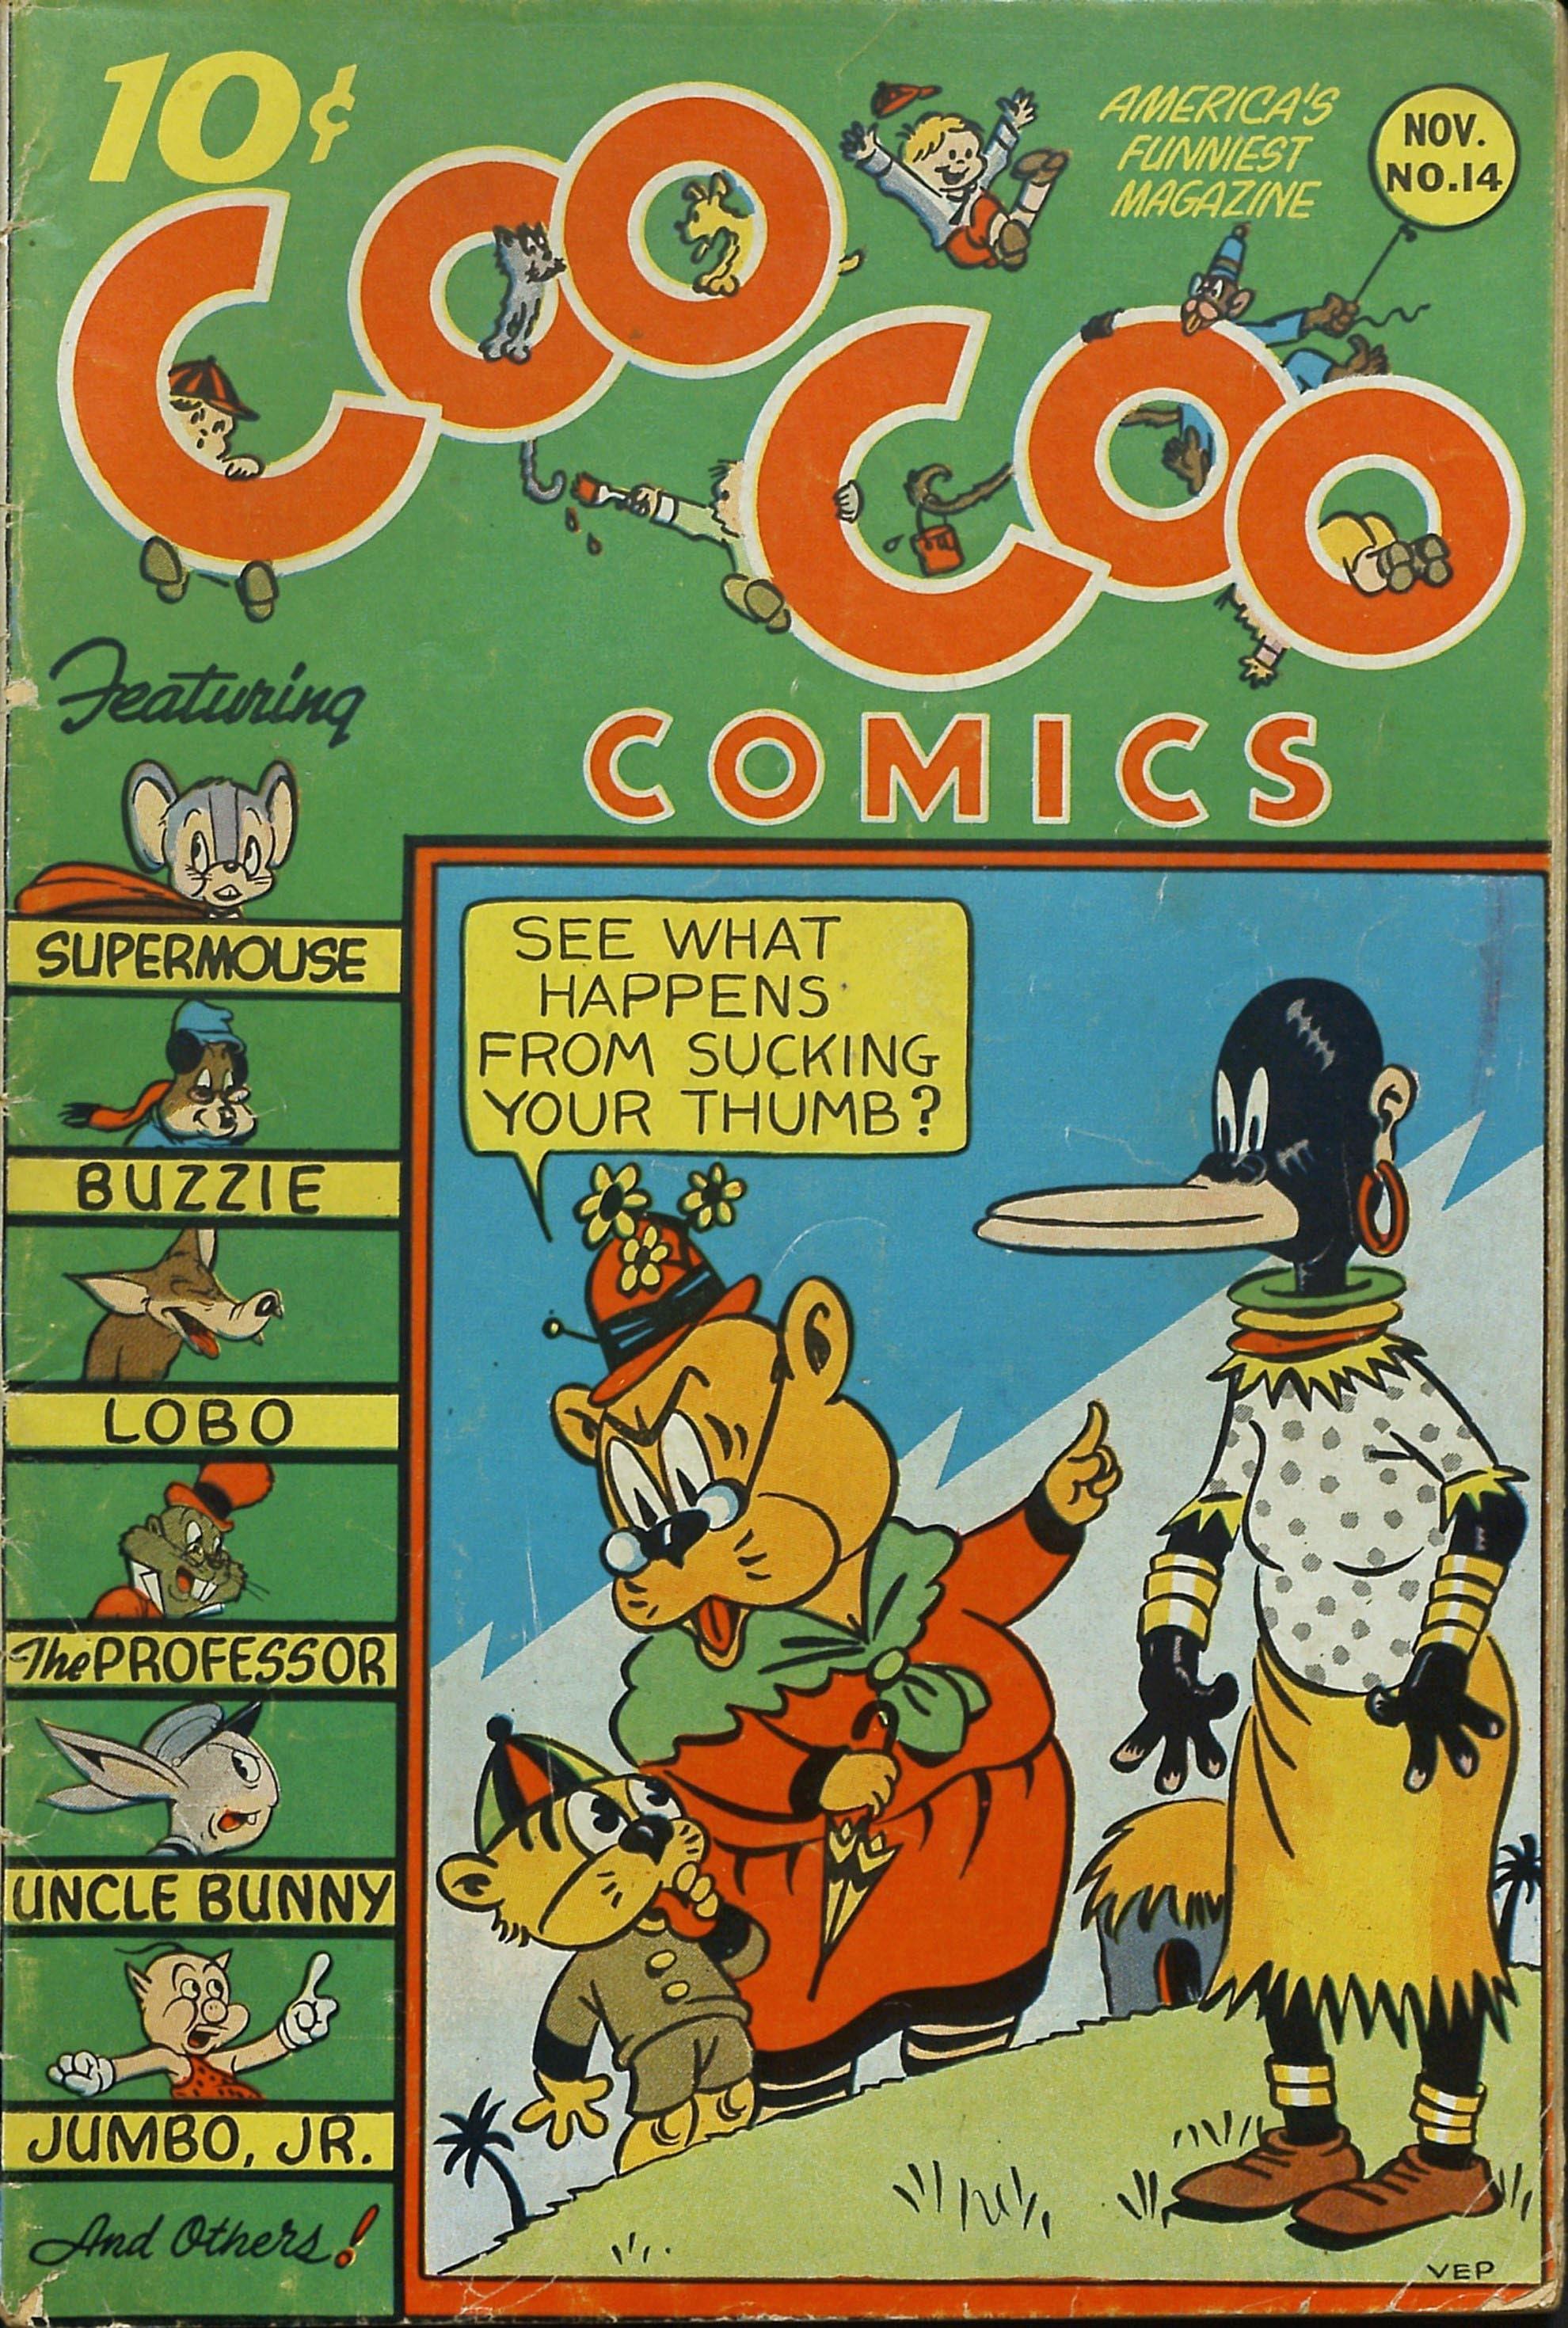 Coo Coo Comics 14 Page 1